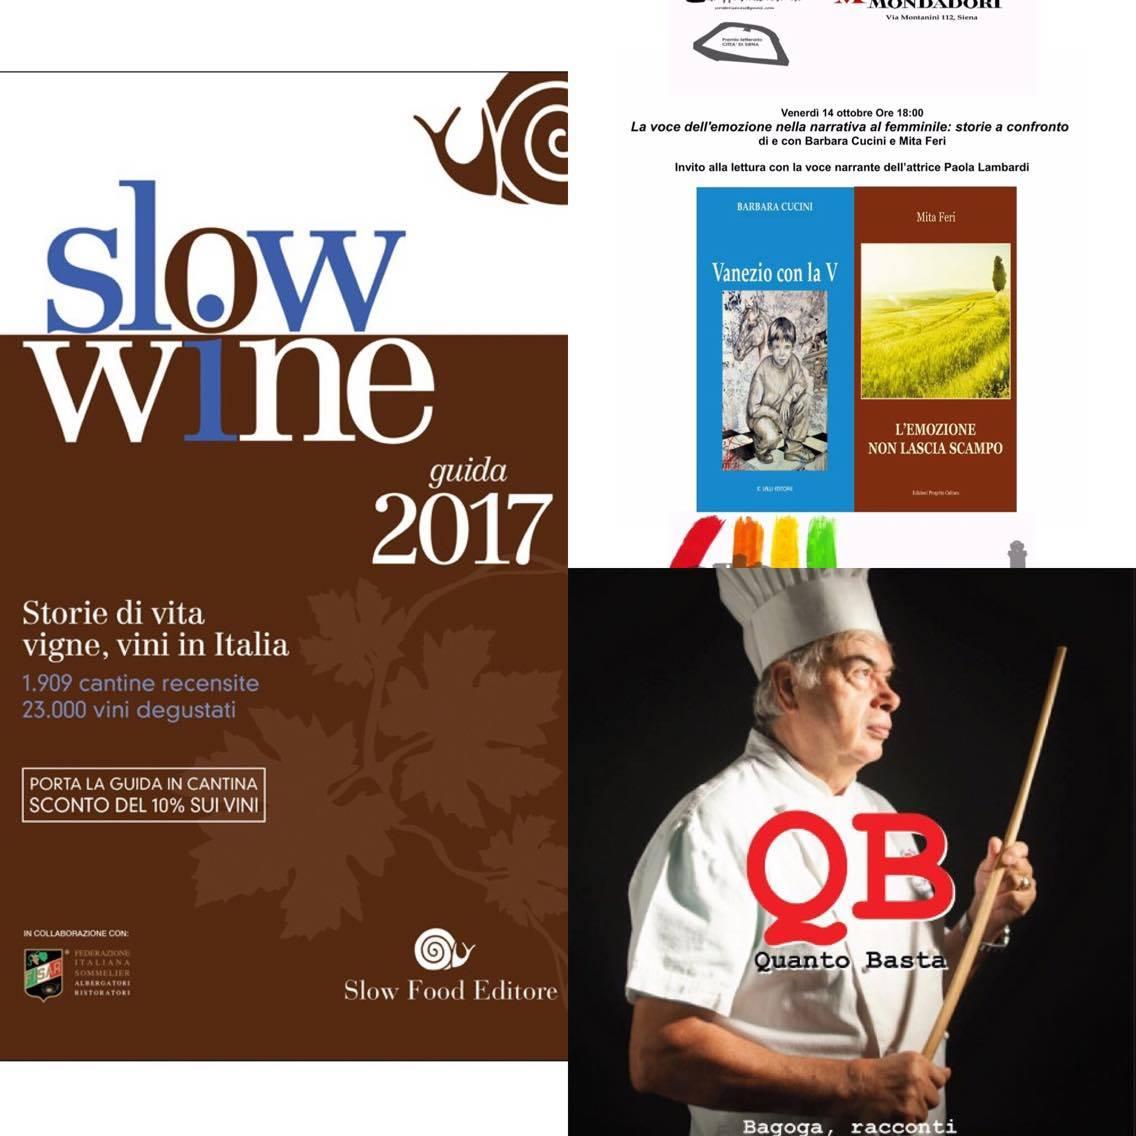 Sow Wine, Bagoaga e iibri degli scrittori senesi